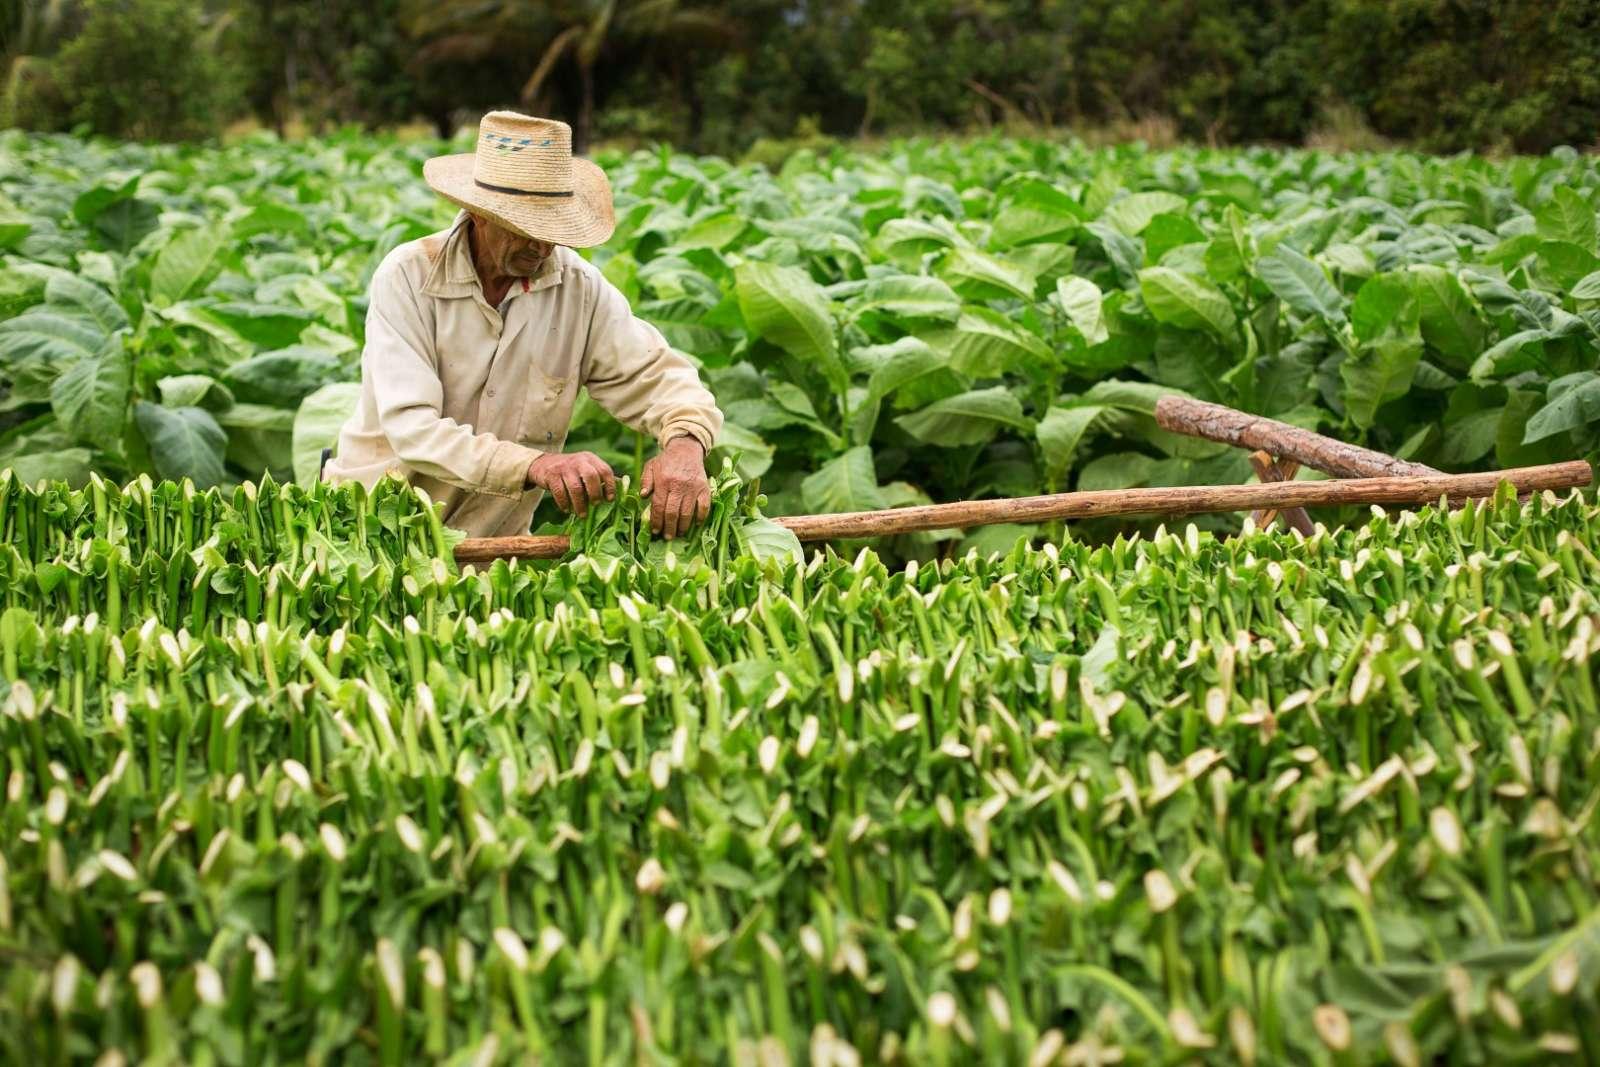 Tobacco farmer harvesting leaves in Vinales, Cuba